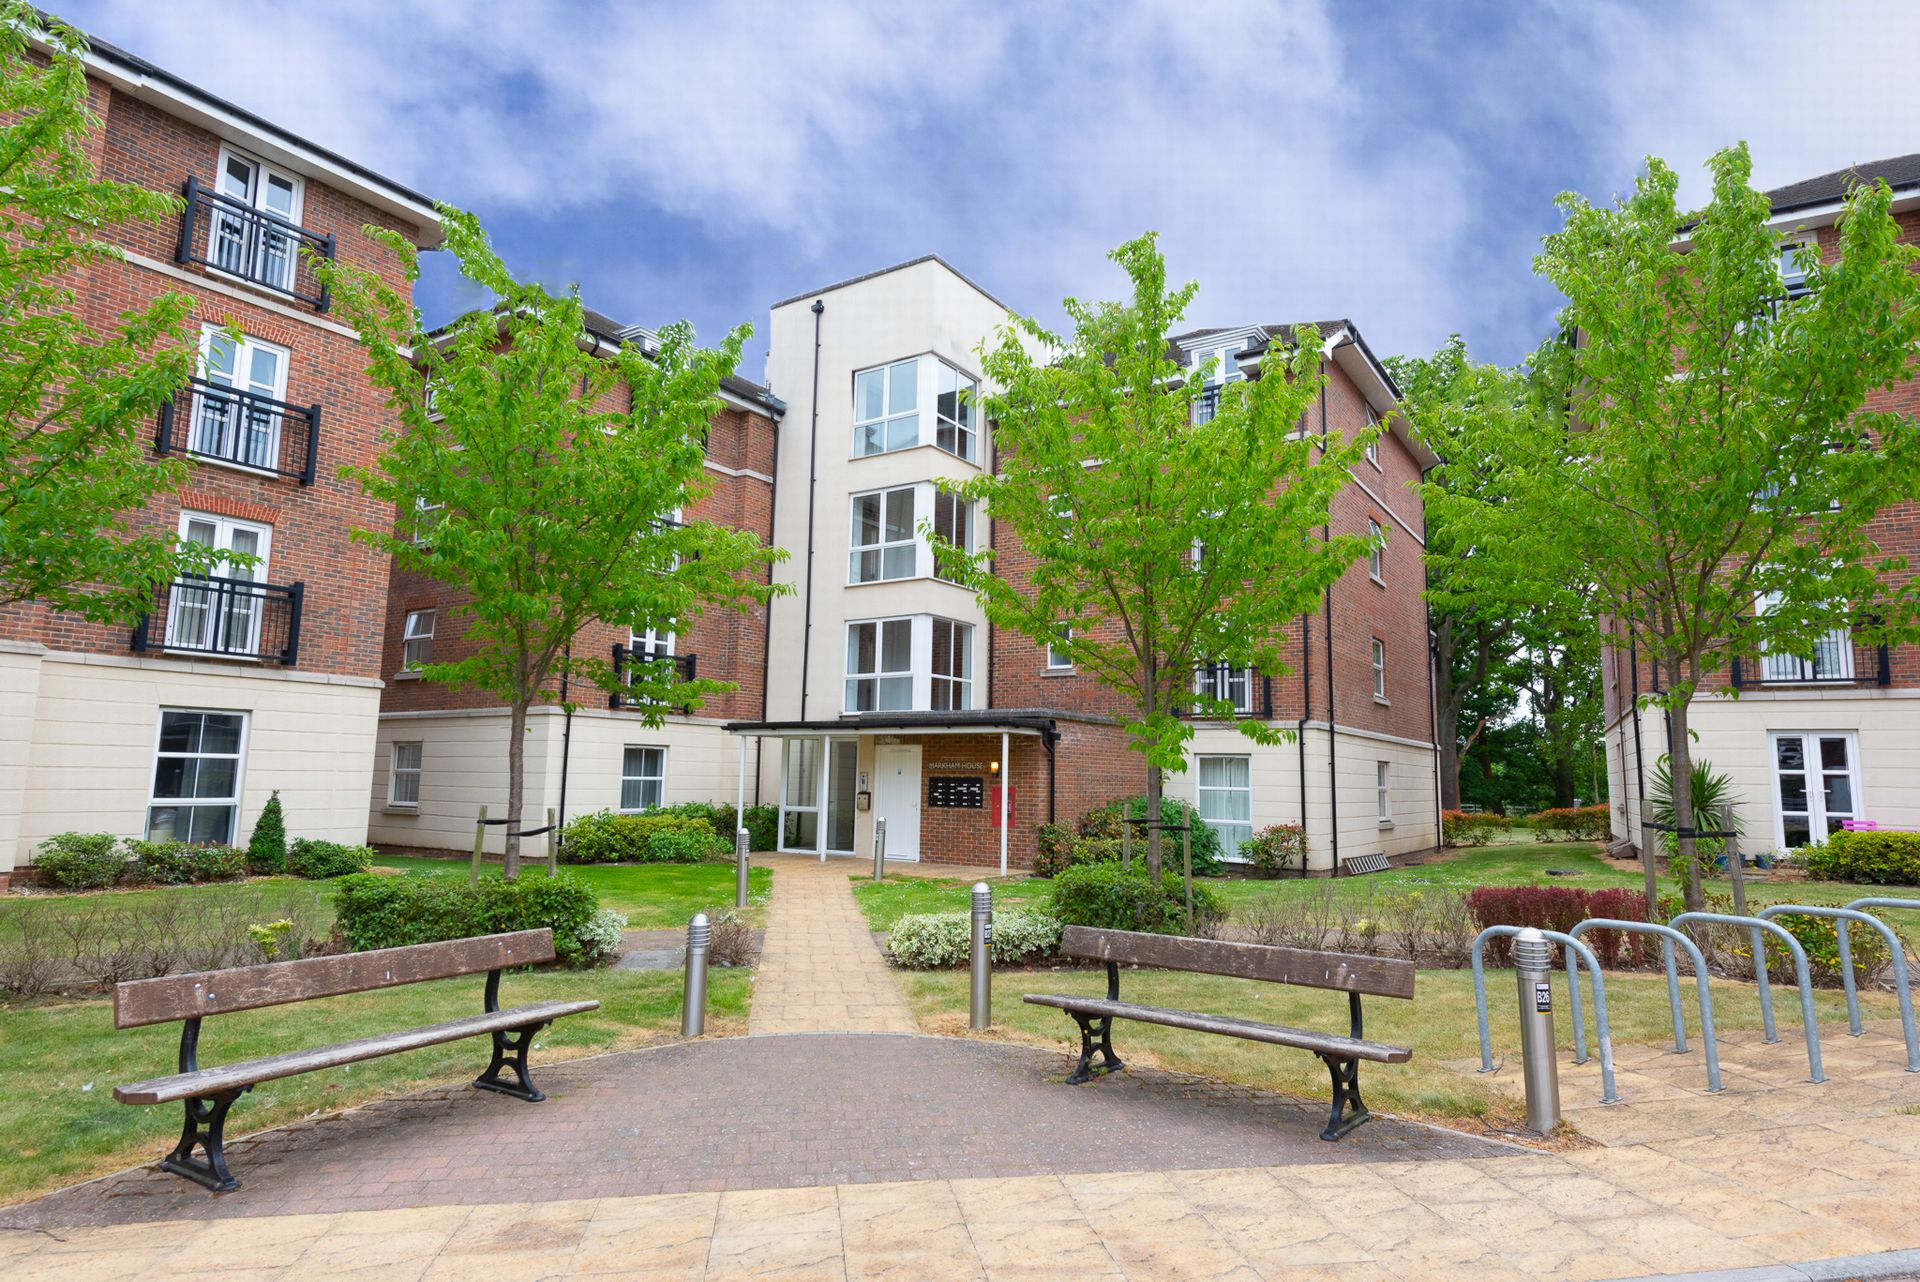 Kenley Place  Farnborough  Farnborough  GU14